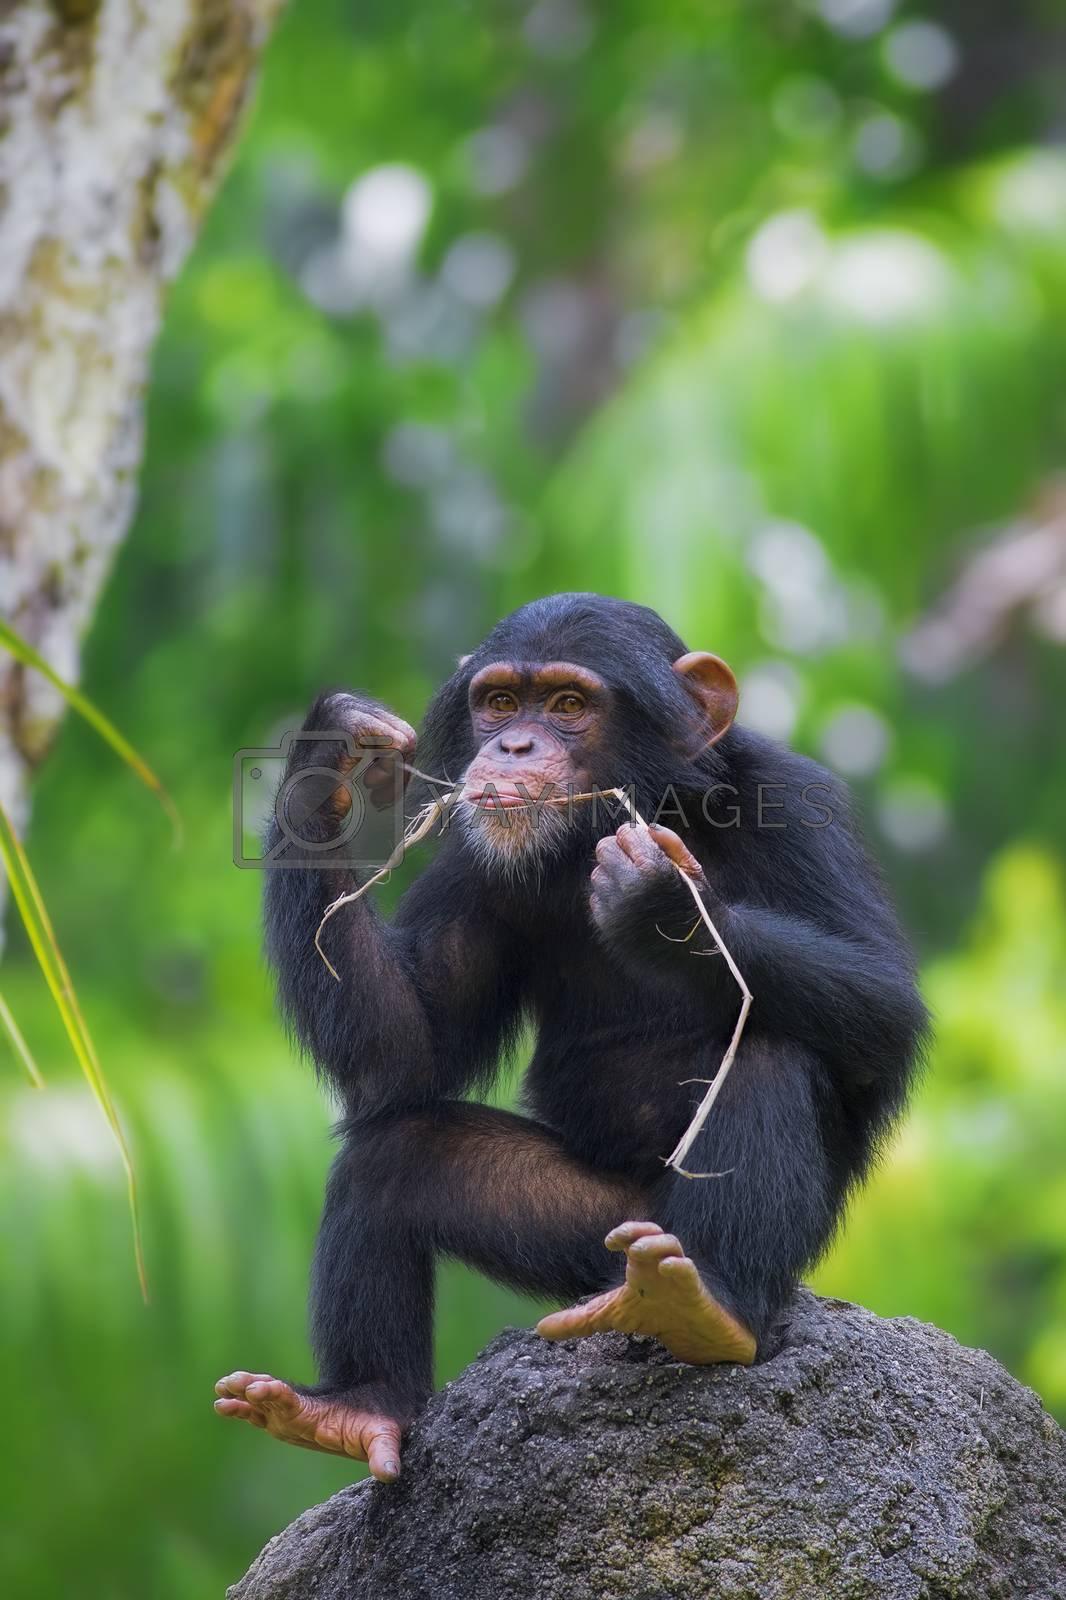 Common Chimpanzee by kjorgen